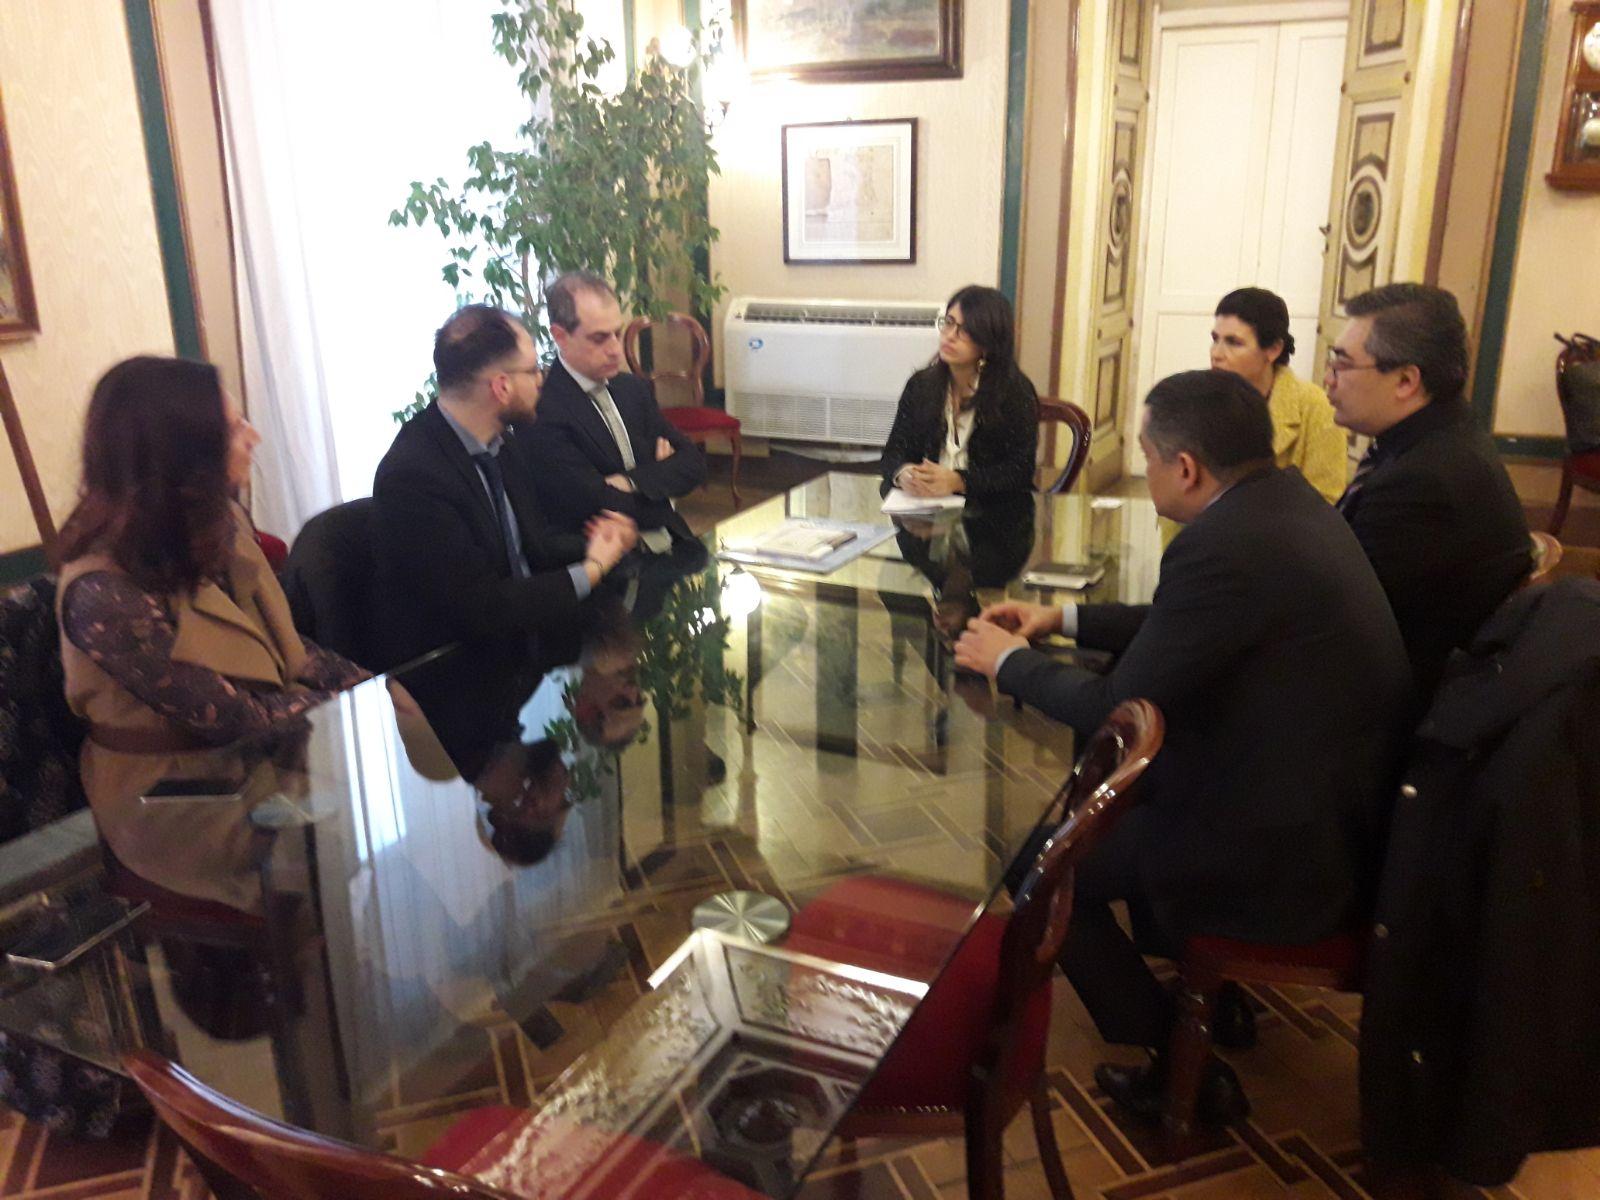 Napoli, delegazione italo-uzbeka incontra l'assessore Alessandra Sardu